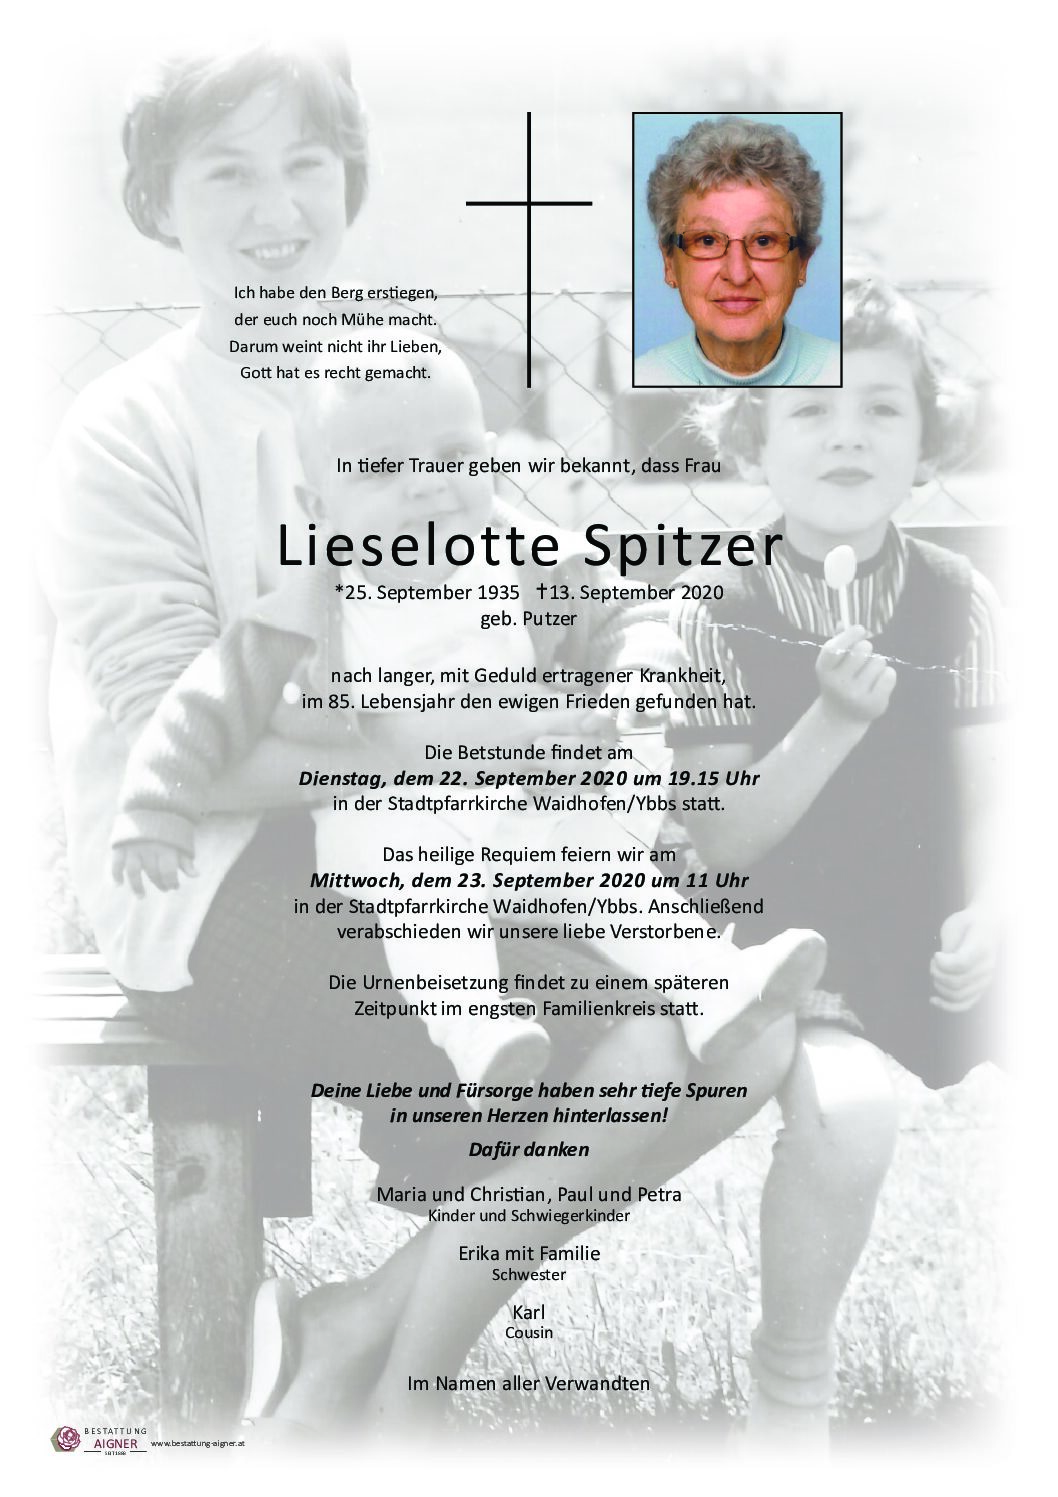 Lieselotte Spitzer